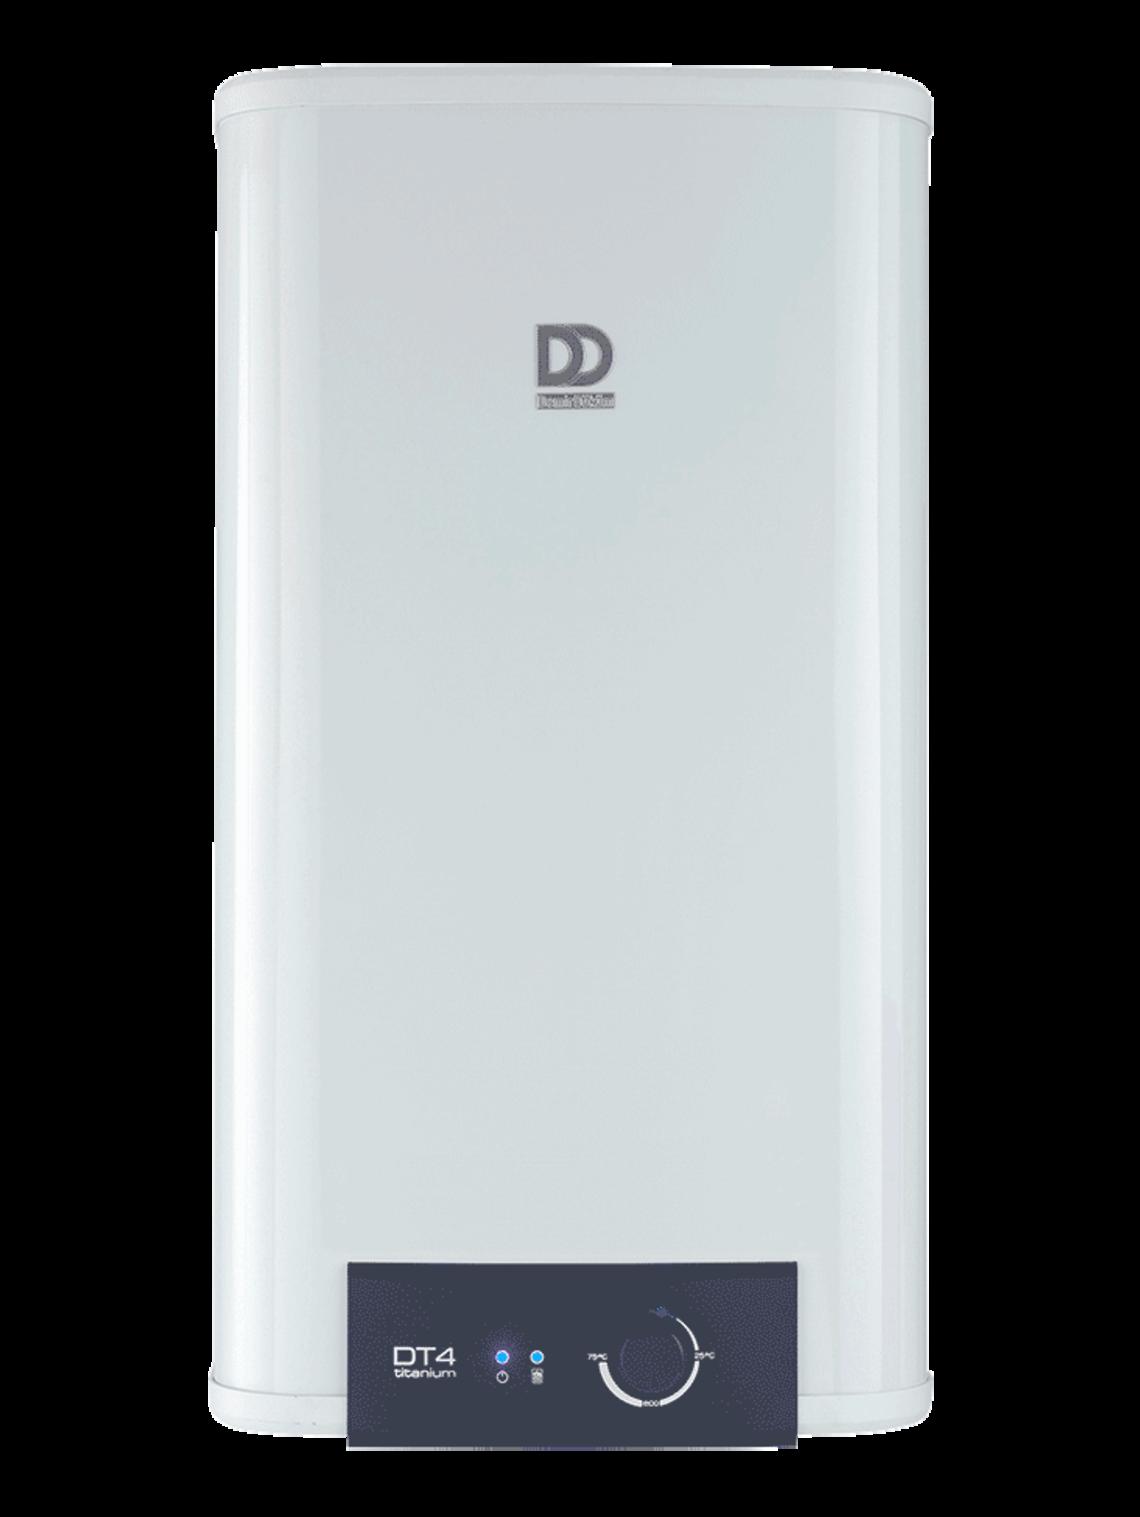 Su qızdırıcı Demir Dokum DT4 Titanium Termosifon 80 L  - 1